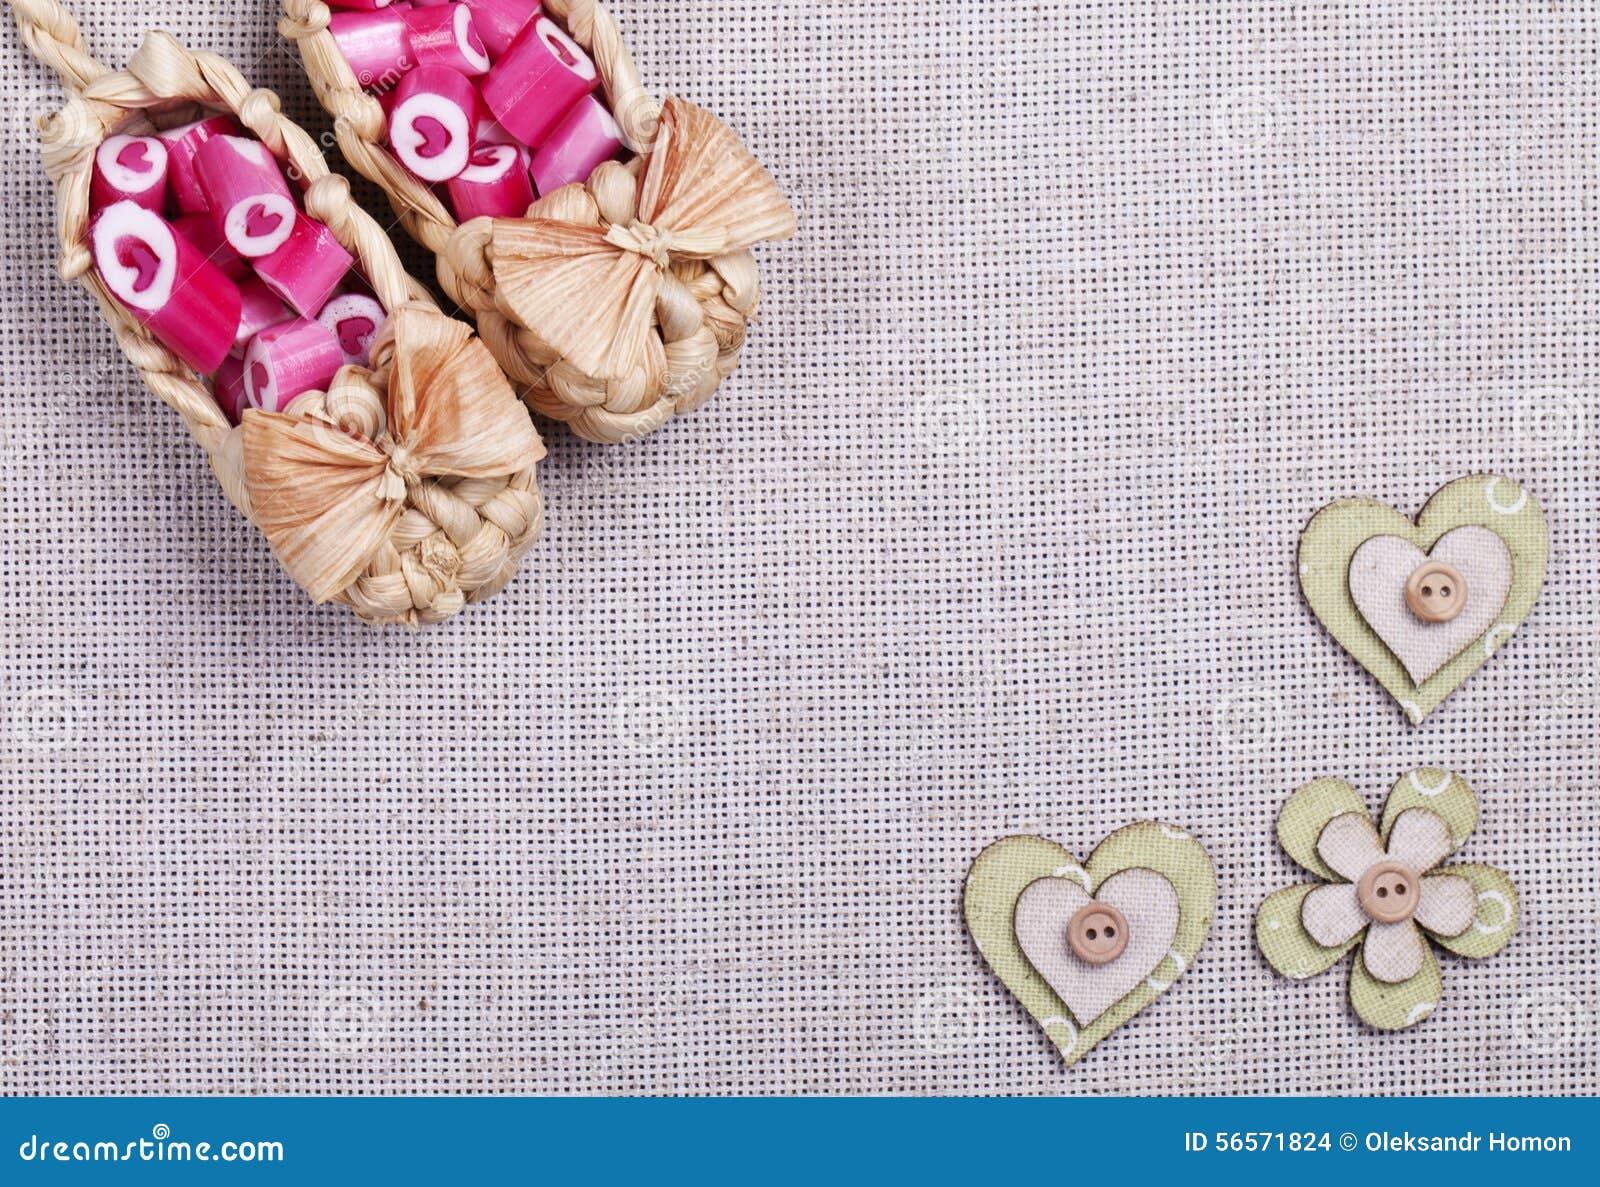 Download Καλοί κάλαμοι καραμελών καρδιών Στοκ Εικόνες - εικόνα από διακοπές, ερωτύλος: 56571824